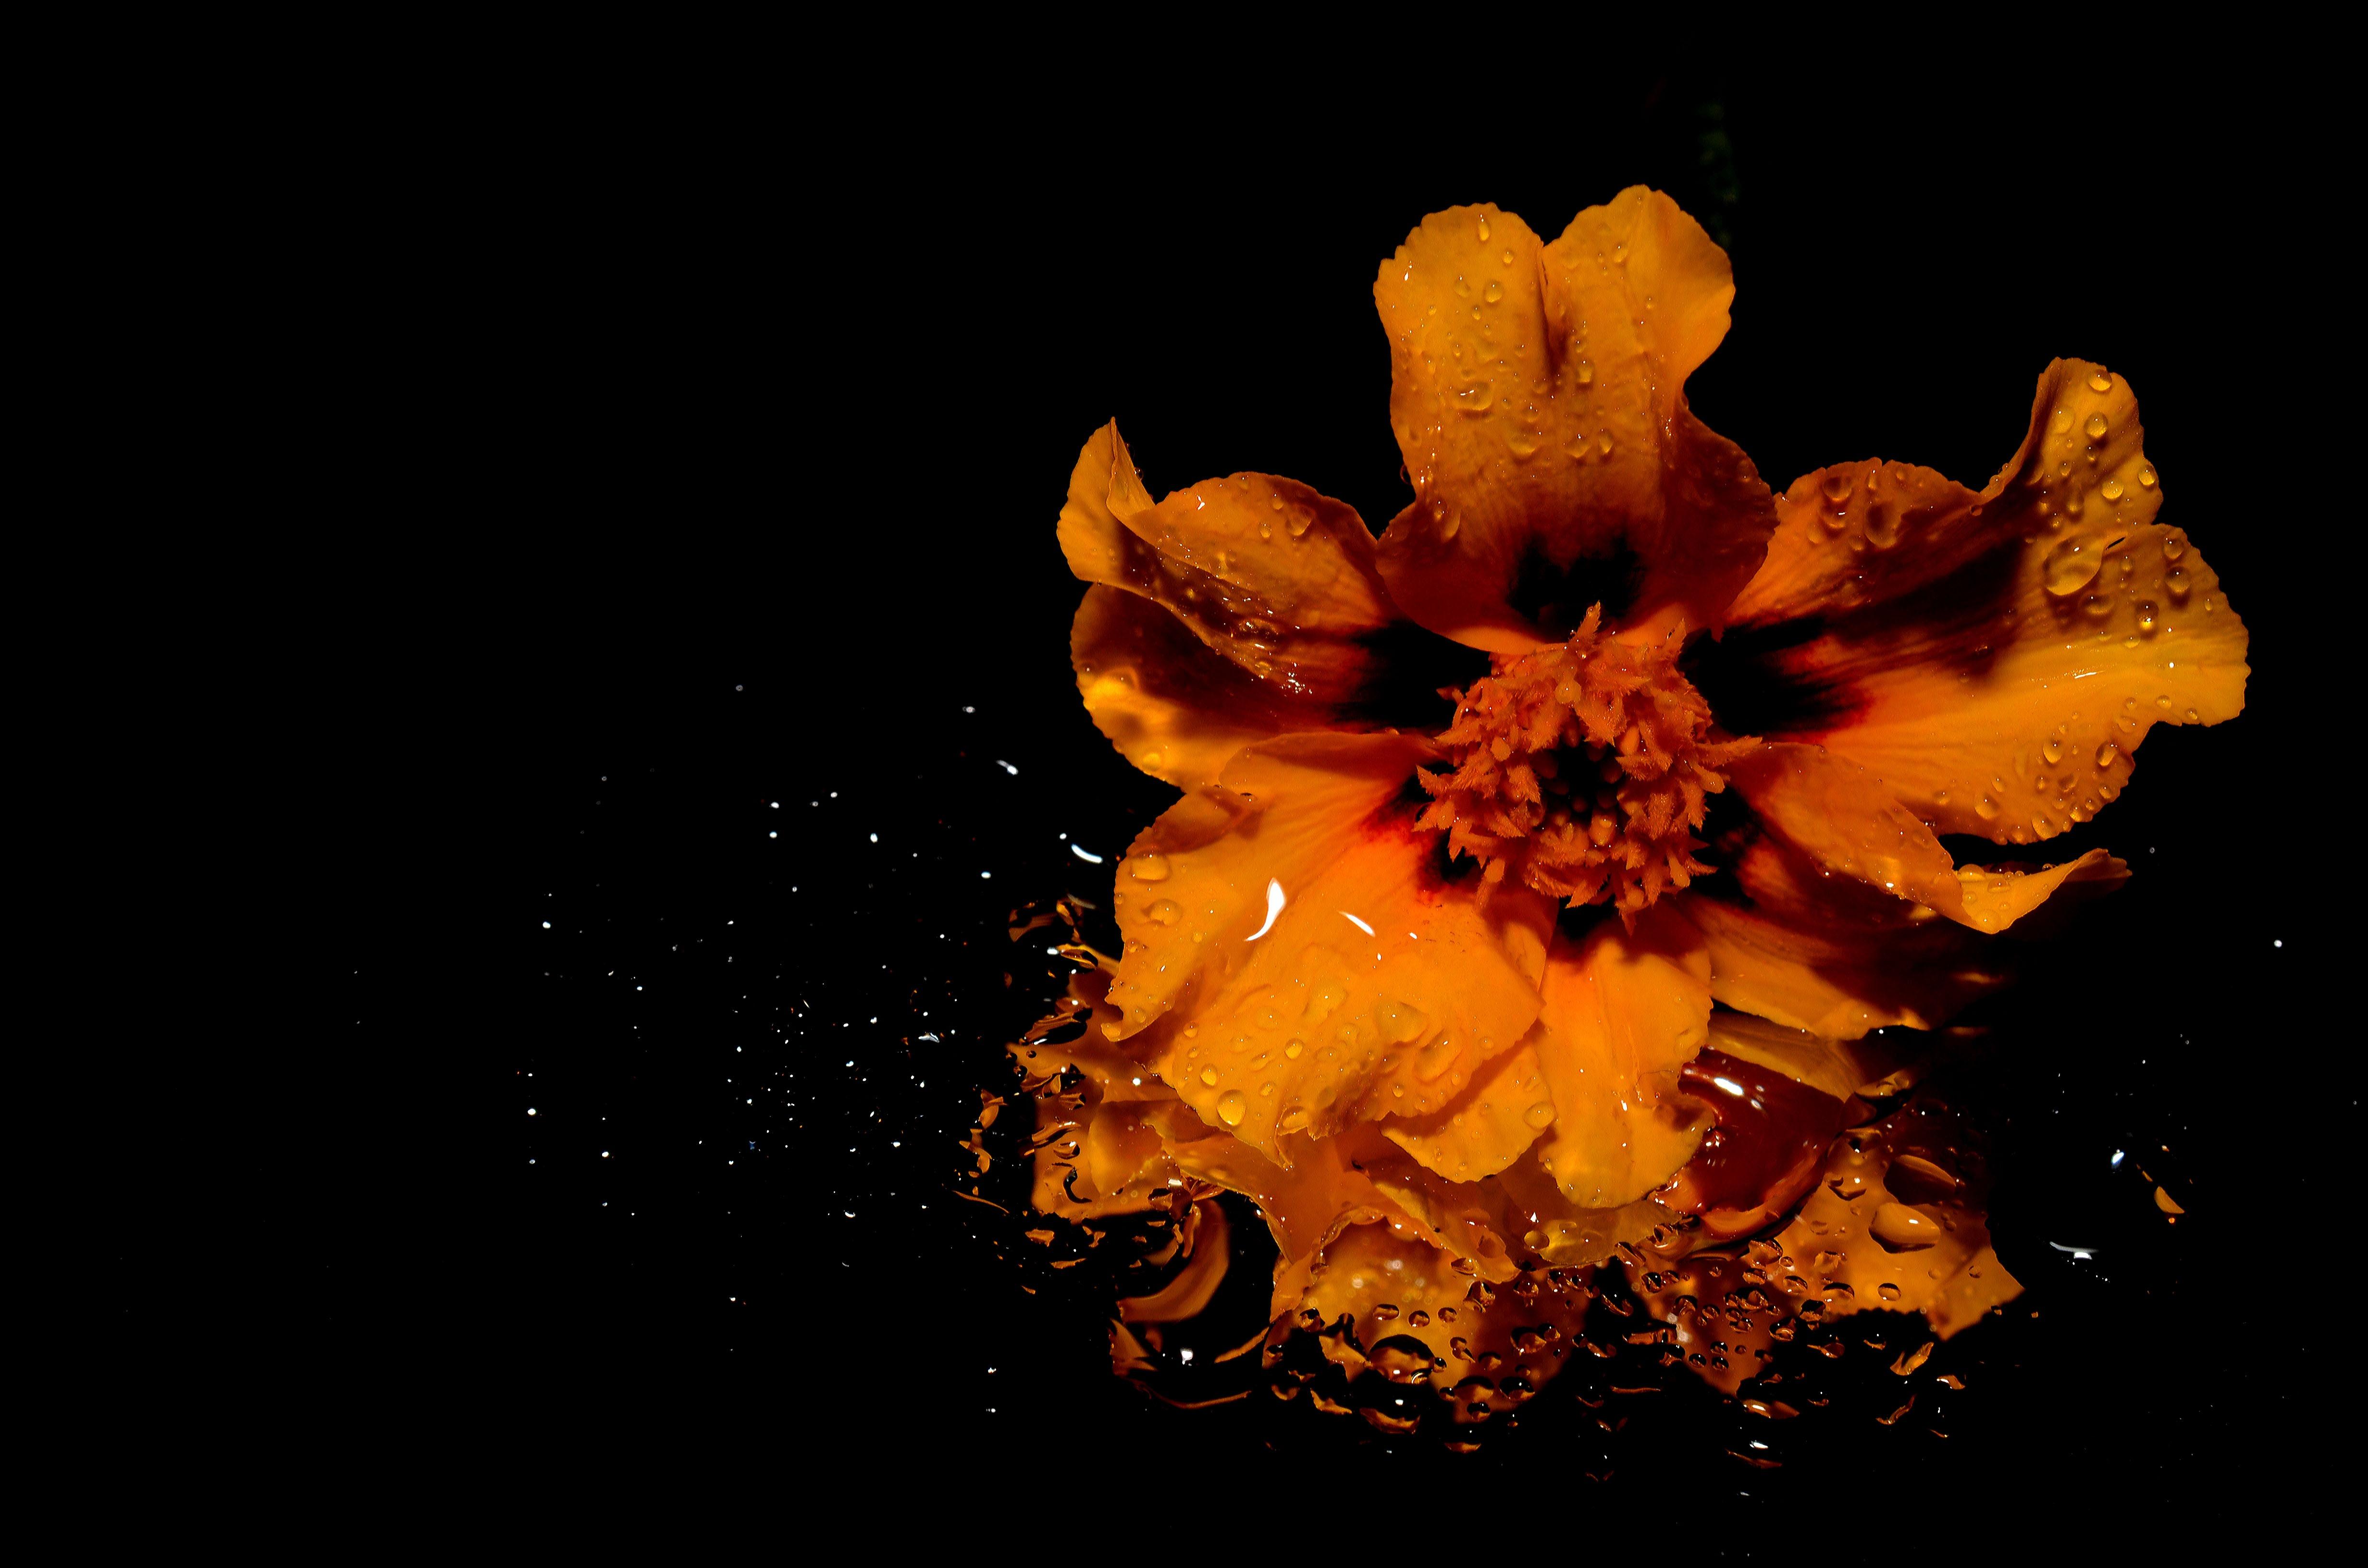 Orange Color Wallpaper Hd Orange Flower Illustration 183 Free Stock Photo